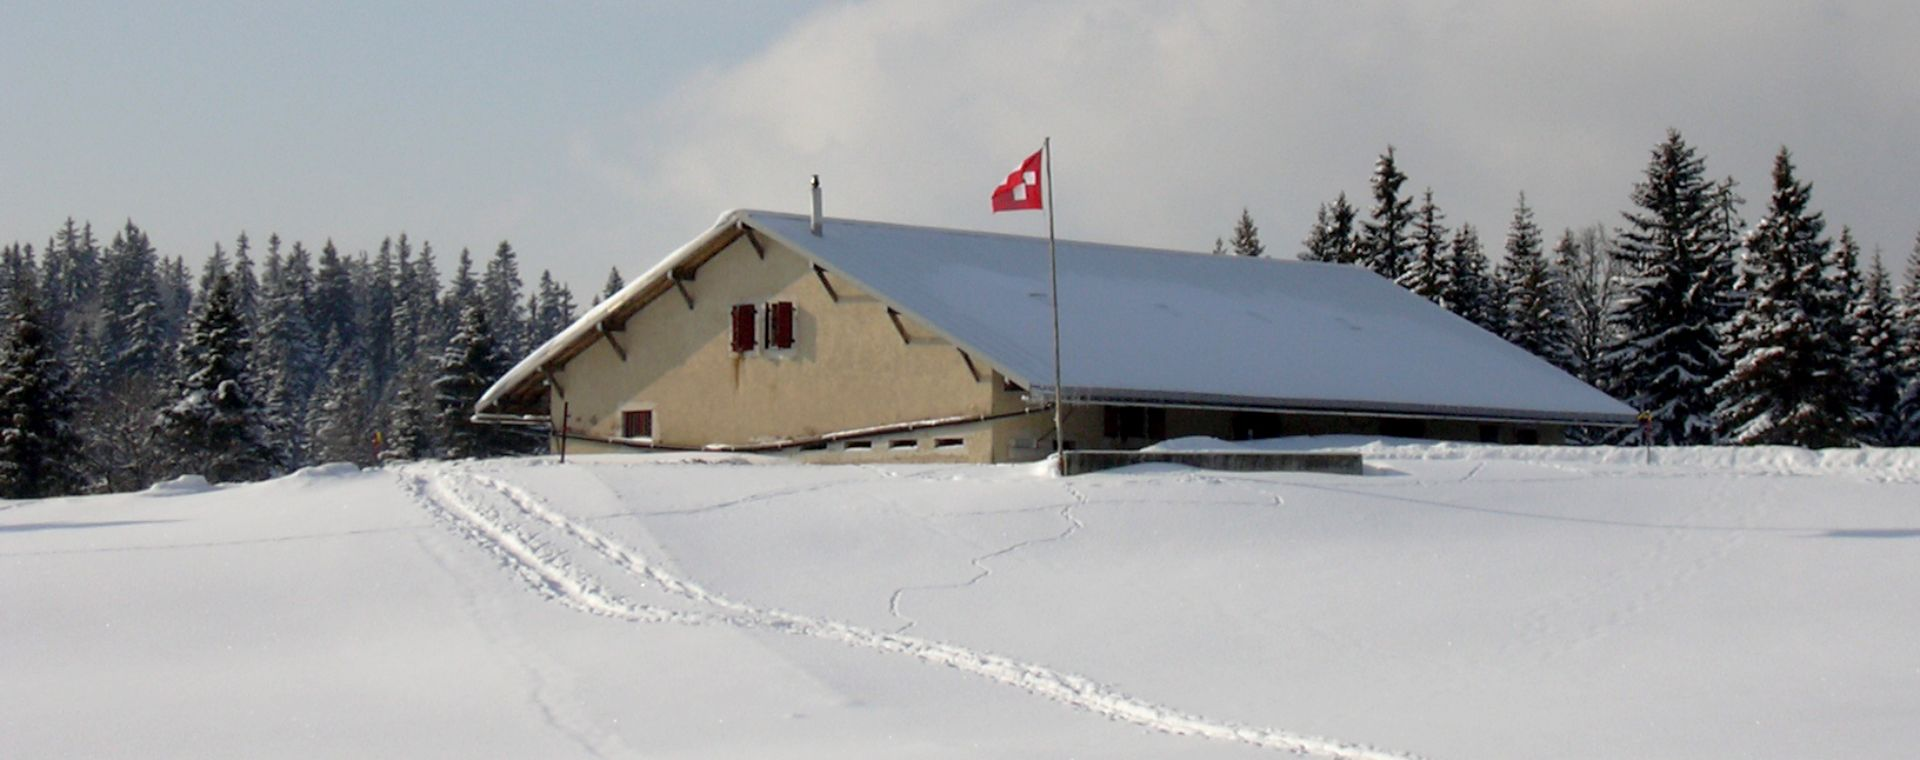 Image Jura franco-suisse